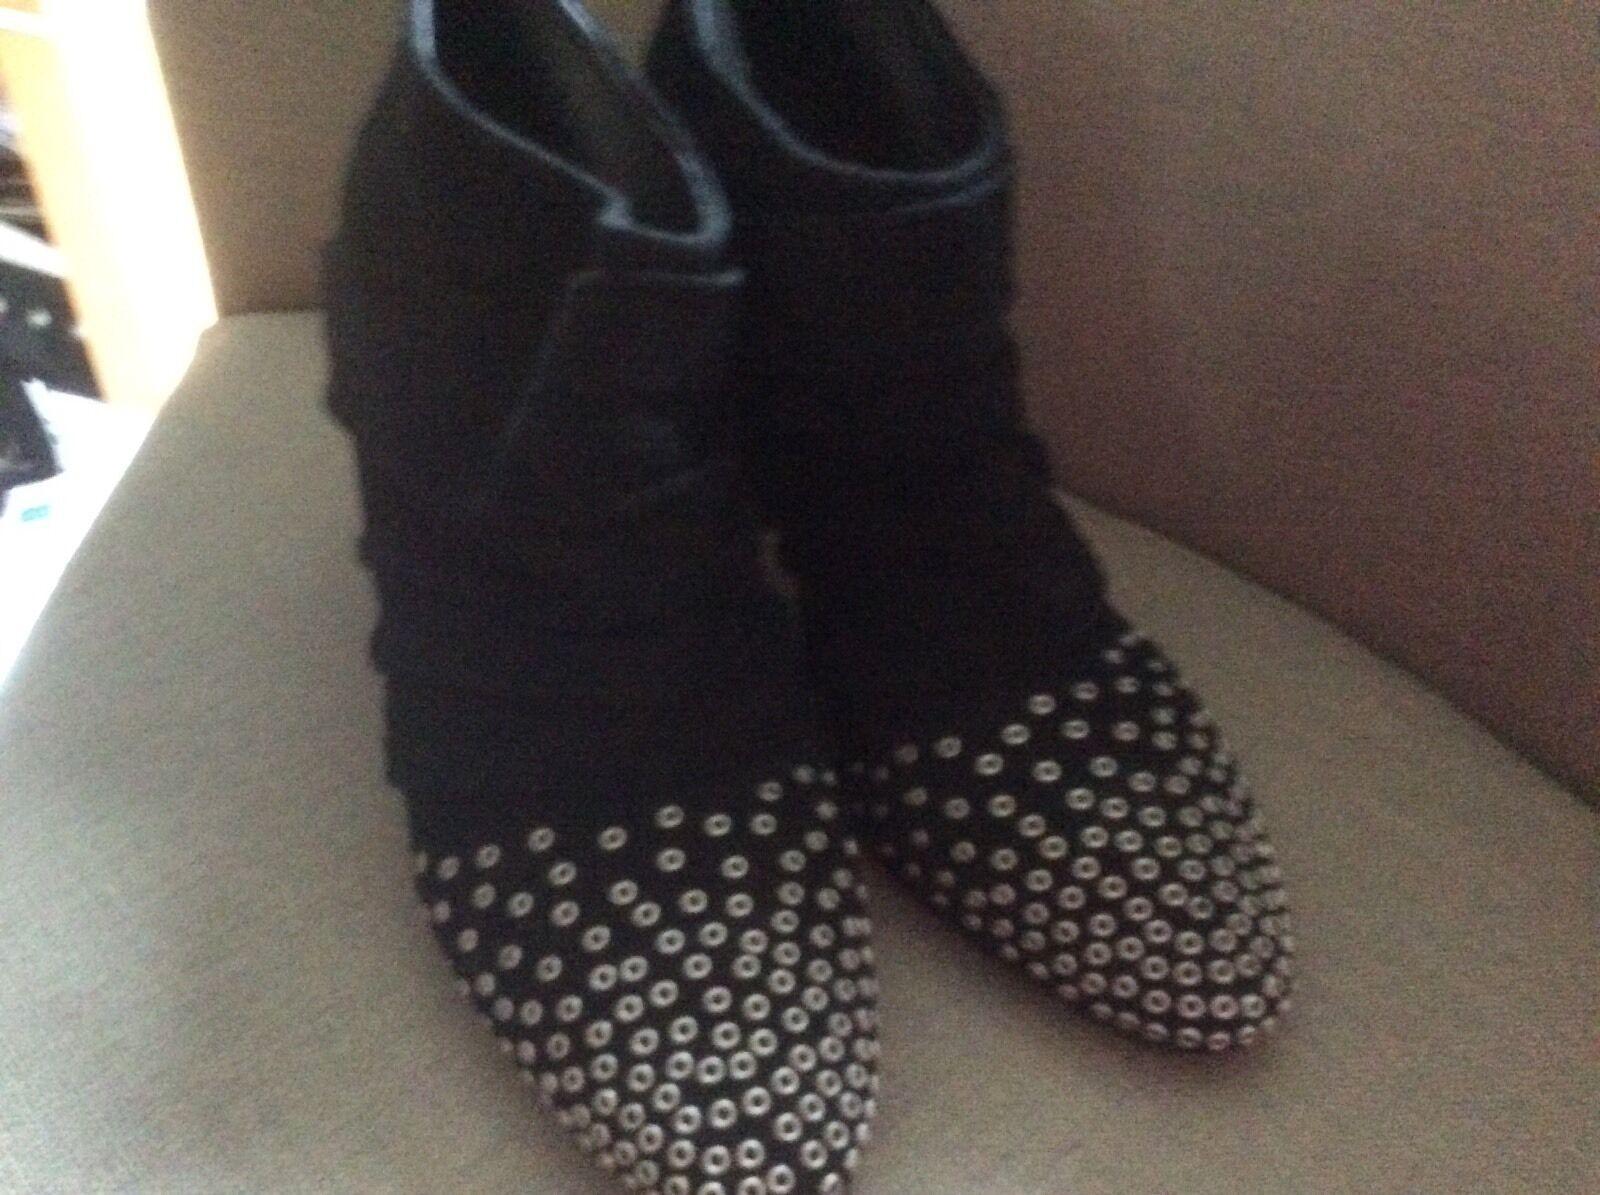 JEFFREY CAMPBELL Famous 6.5 6.5 Famous US Black Leather Platform Boots Heels 4 UK Nasty Gal eff3ea